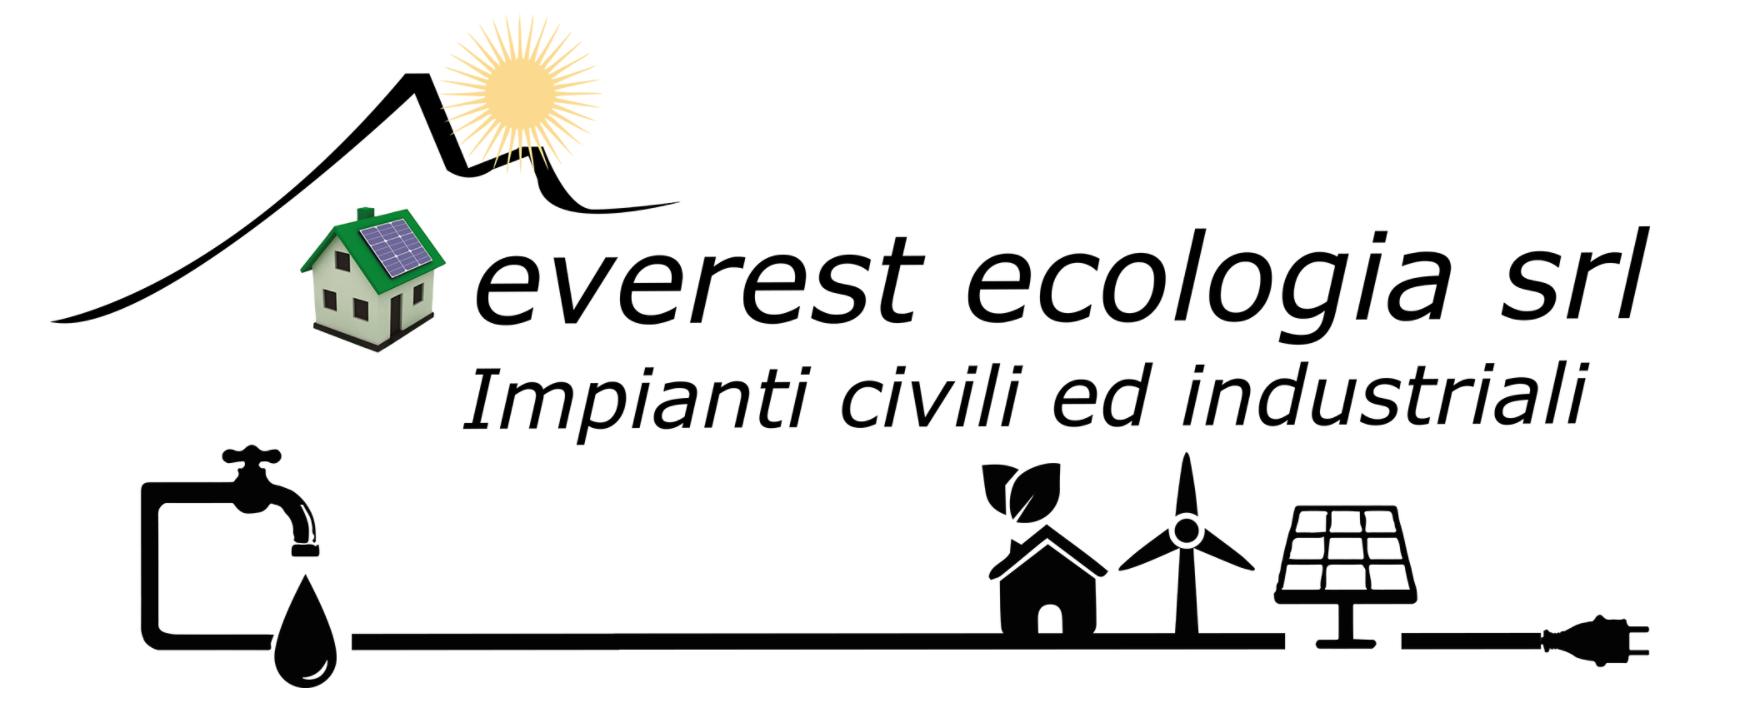 Impianti Civili ed Industriali